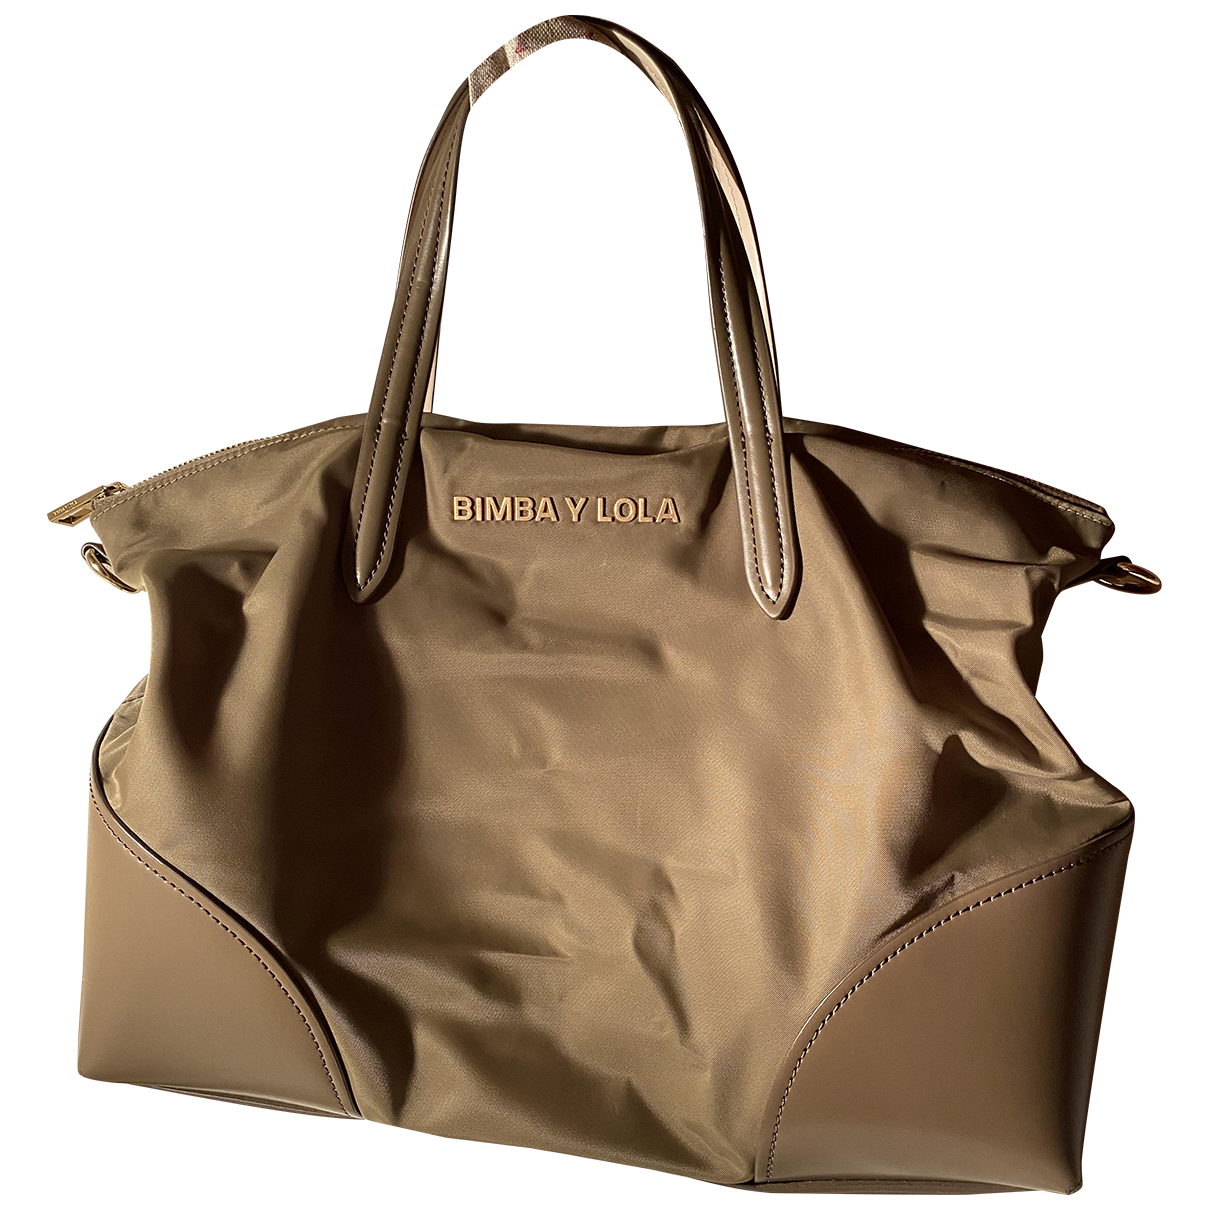 Bimba Y Lola \N Handtasche in  Khaki Polyester